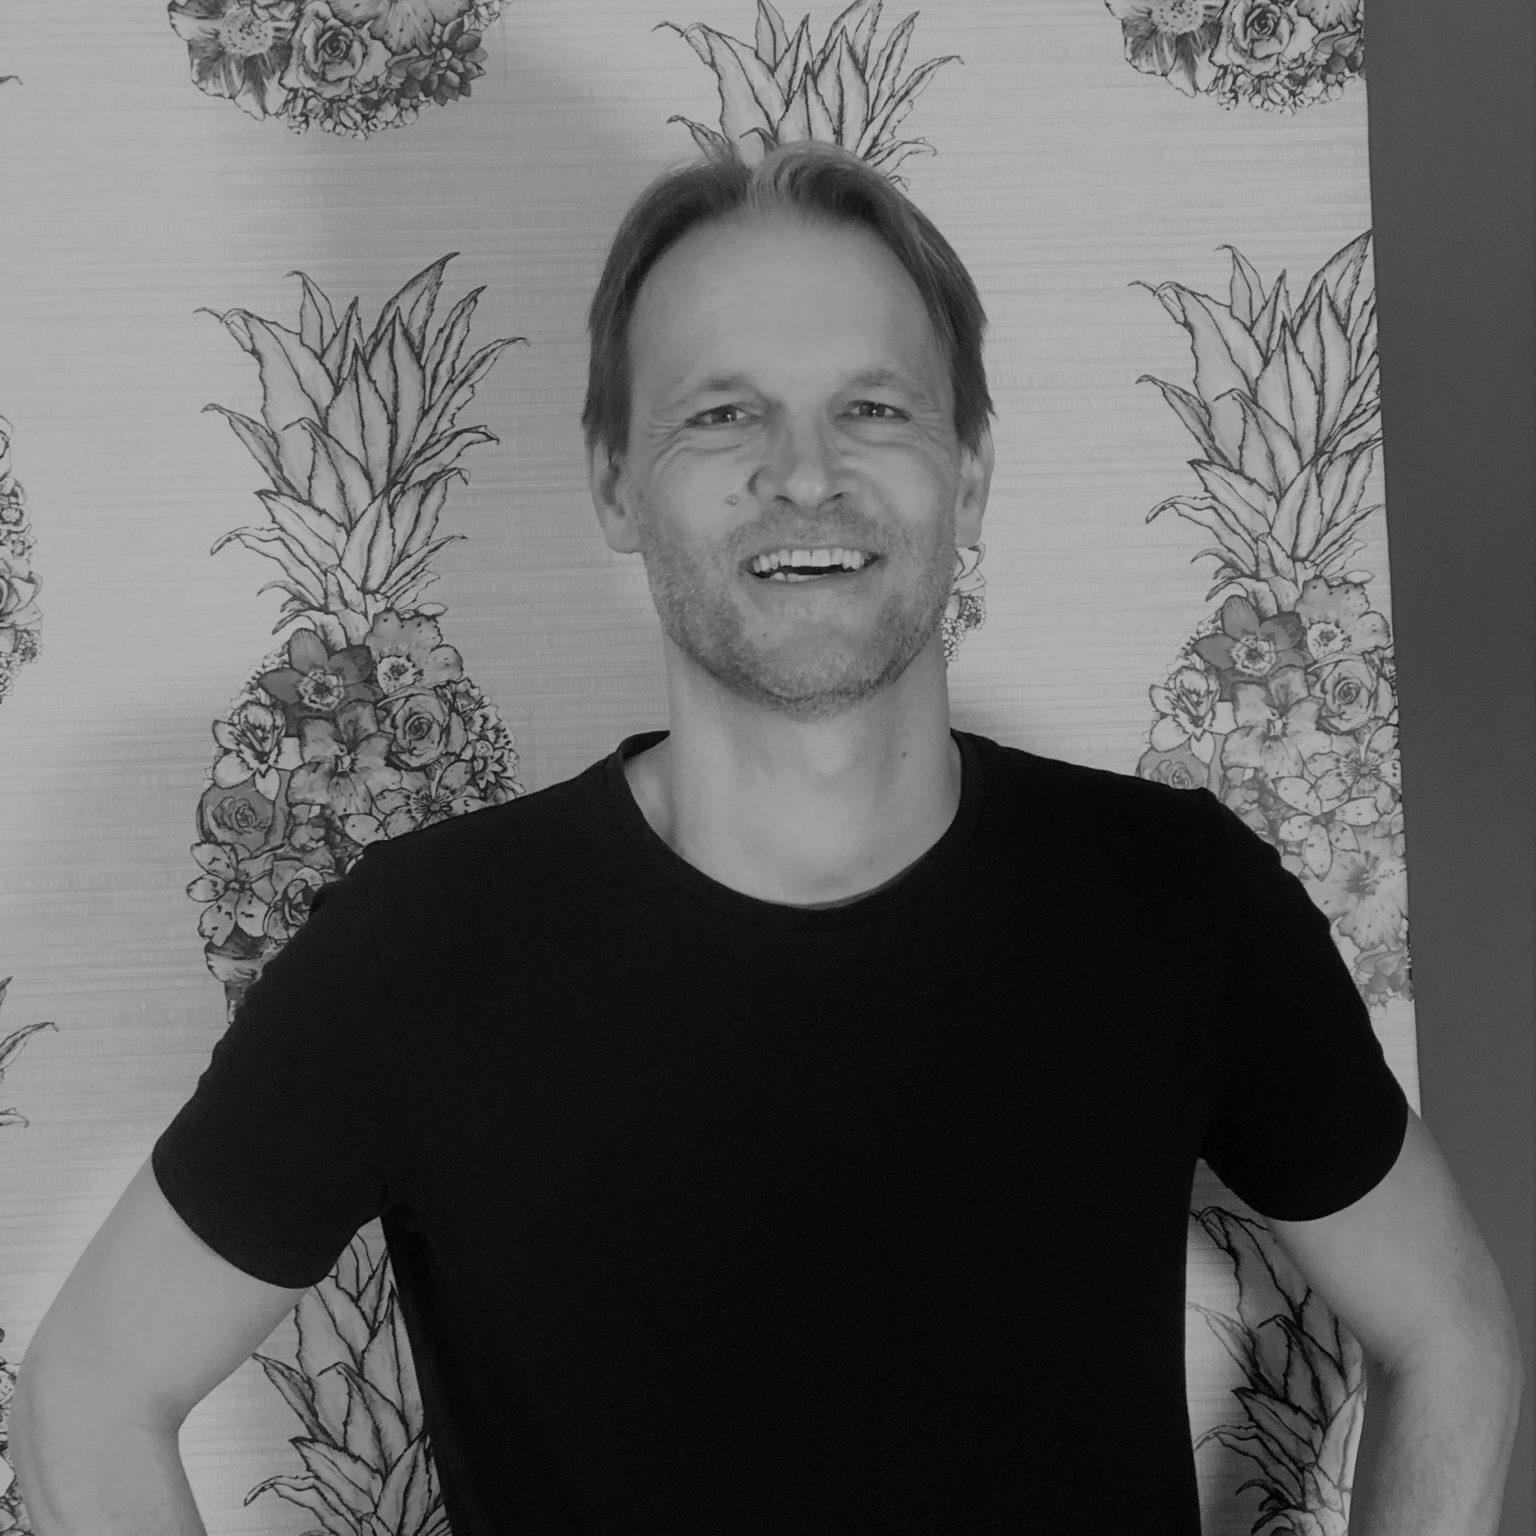 Simon Leuenberger